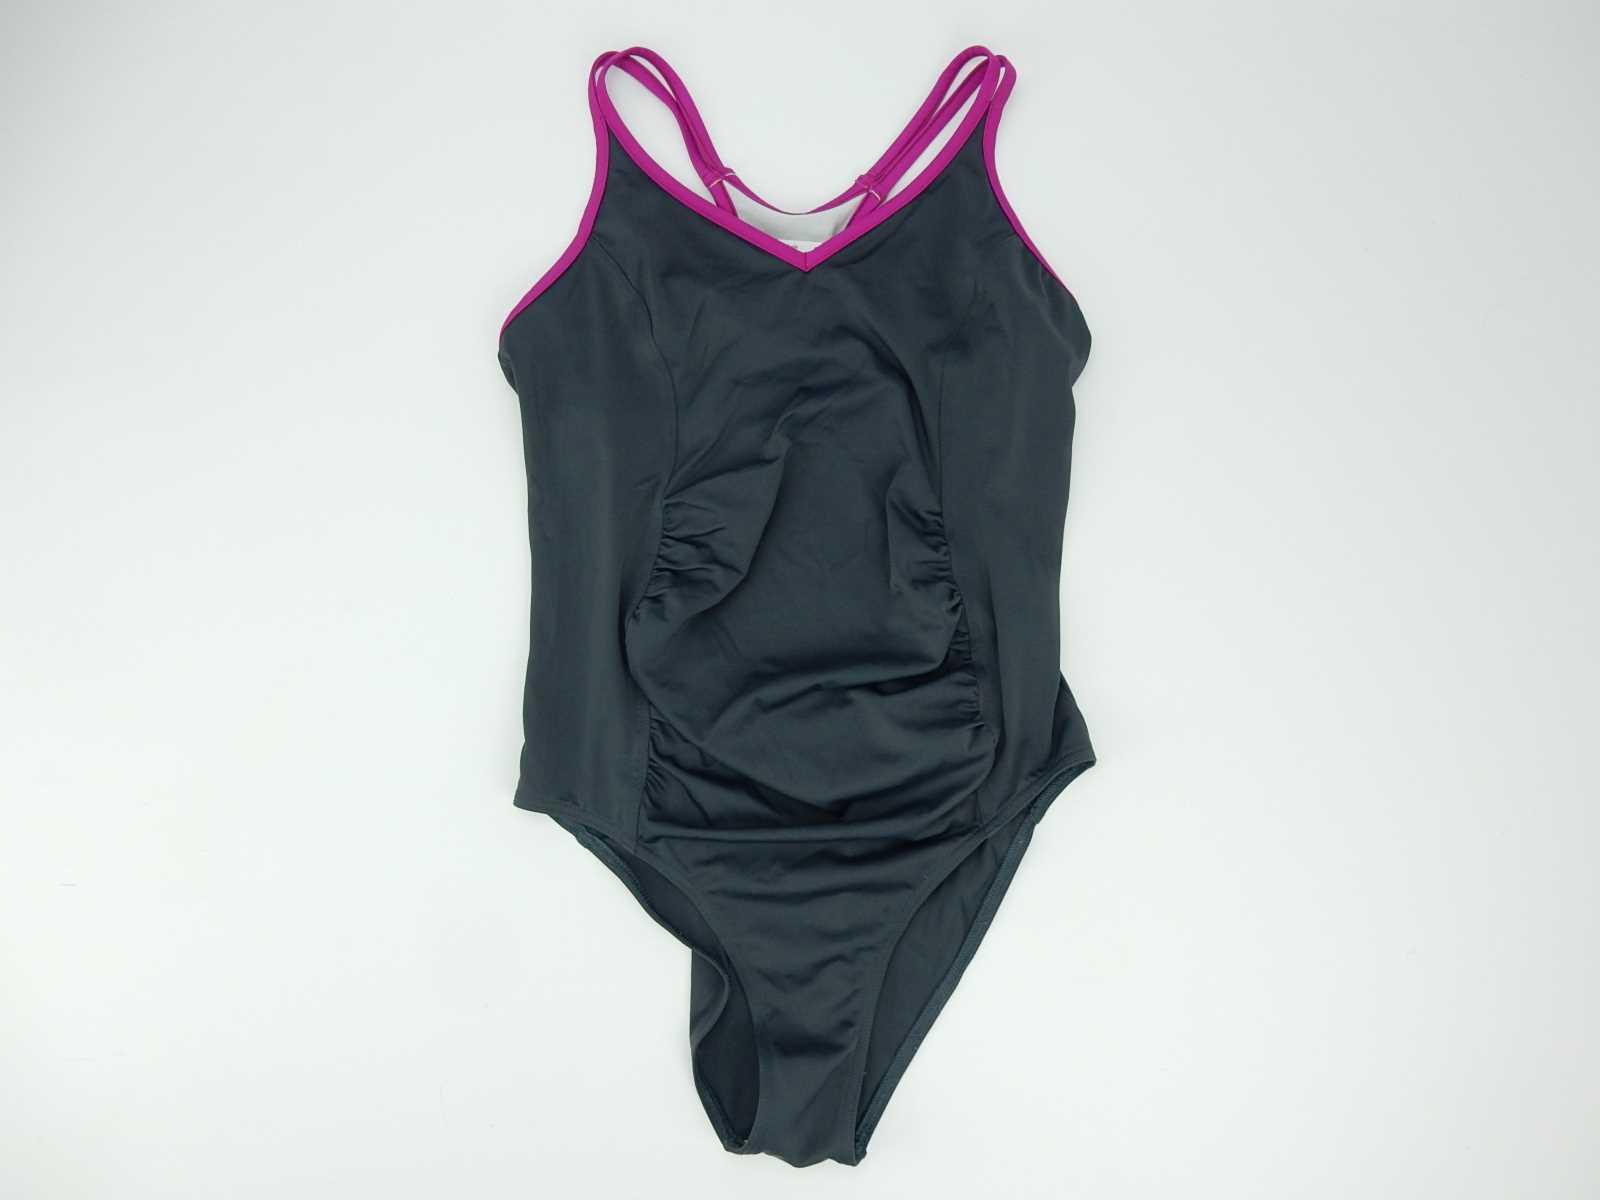 maillot de bain femme enceinte 40 go sport. Black Bedroom Furniture Sets. Home Design Ideas